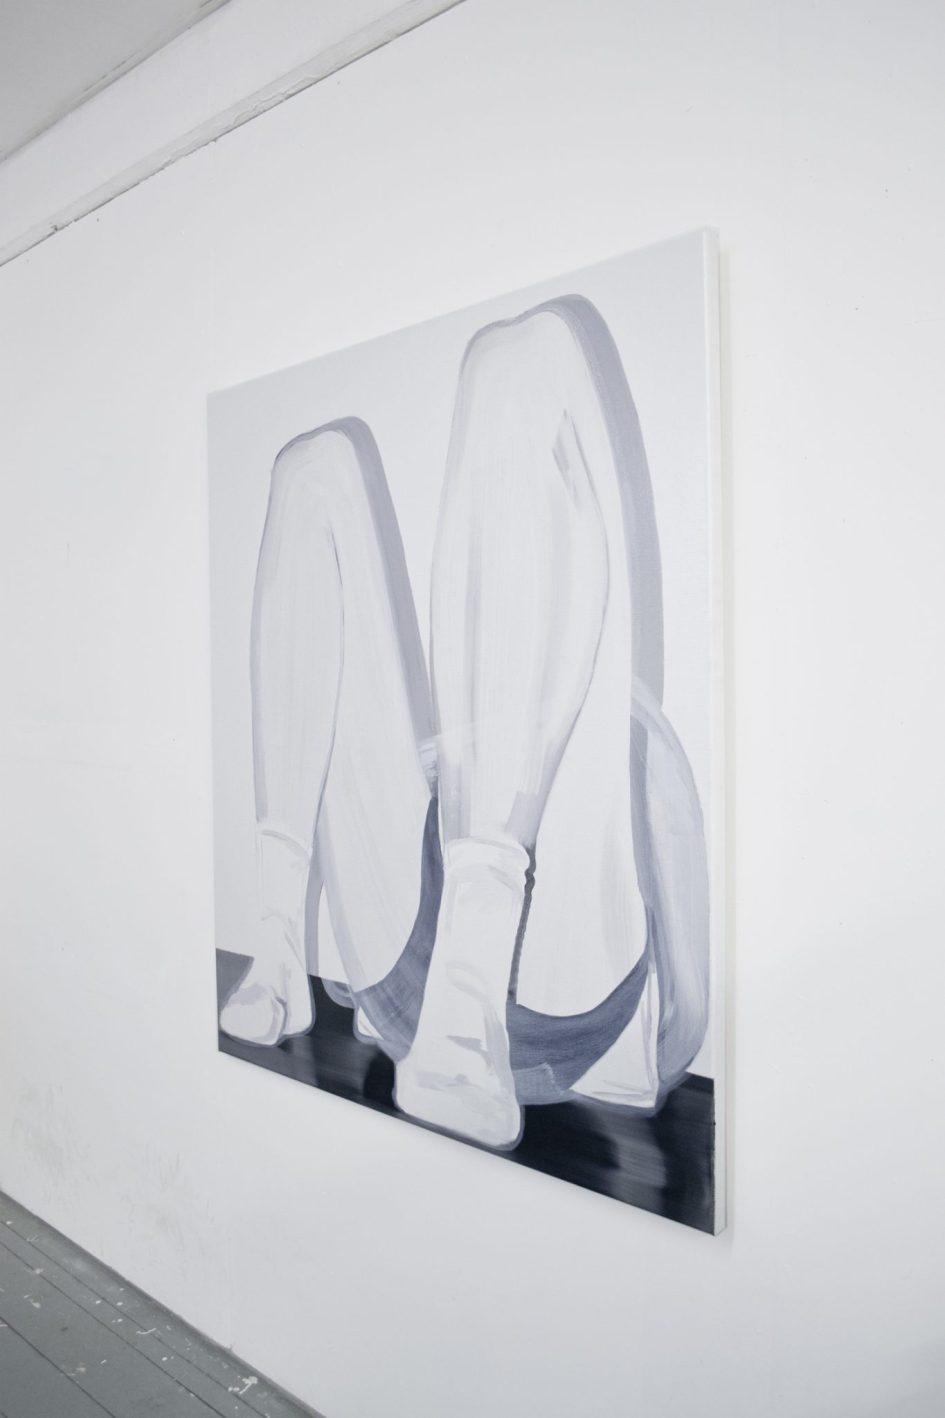 JWAN YOSEF, art, contemporary art, scandaleproject, visual art, painting, canvas, scandale project,